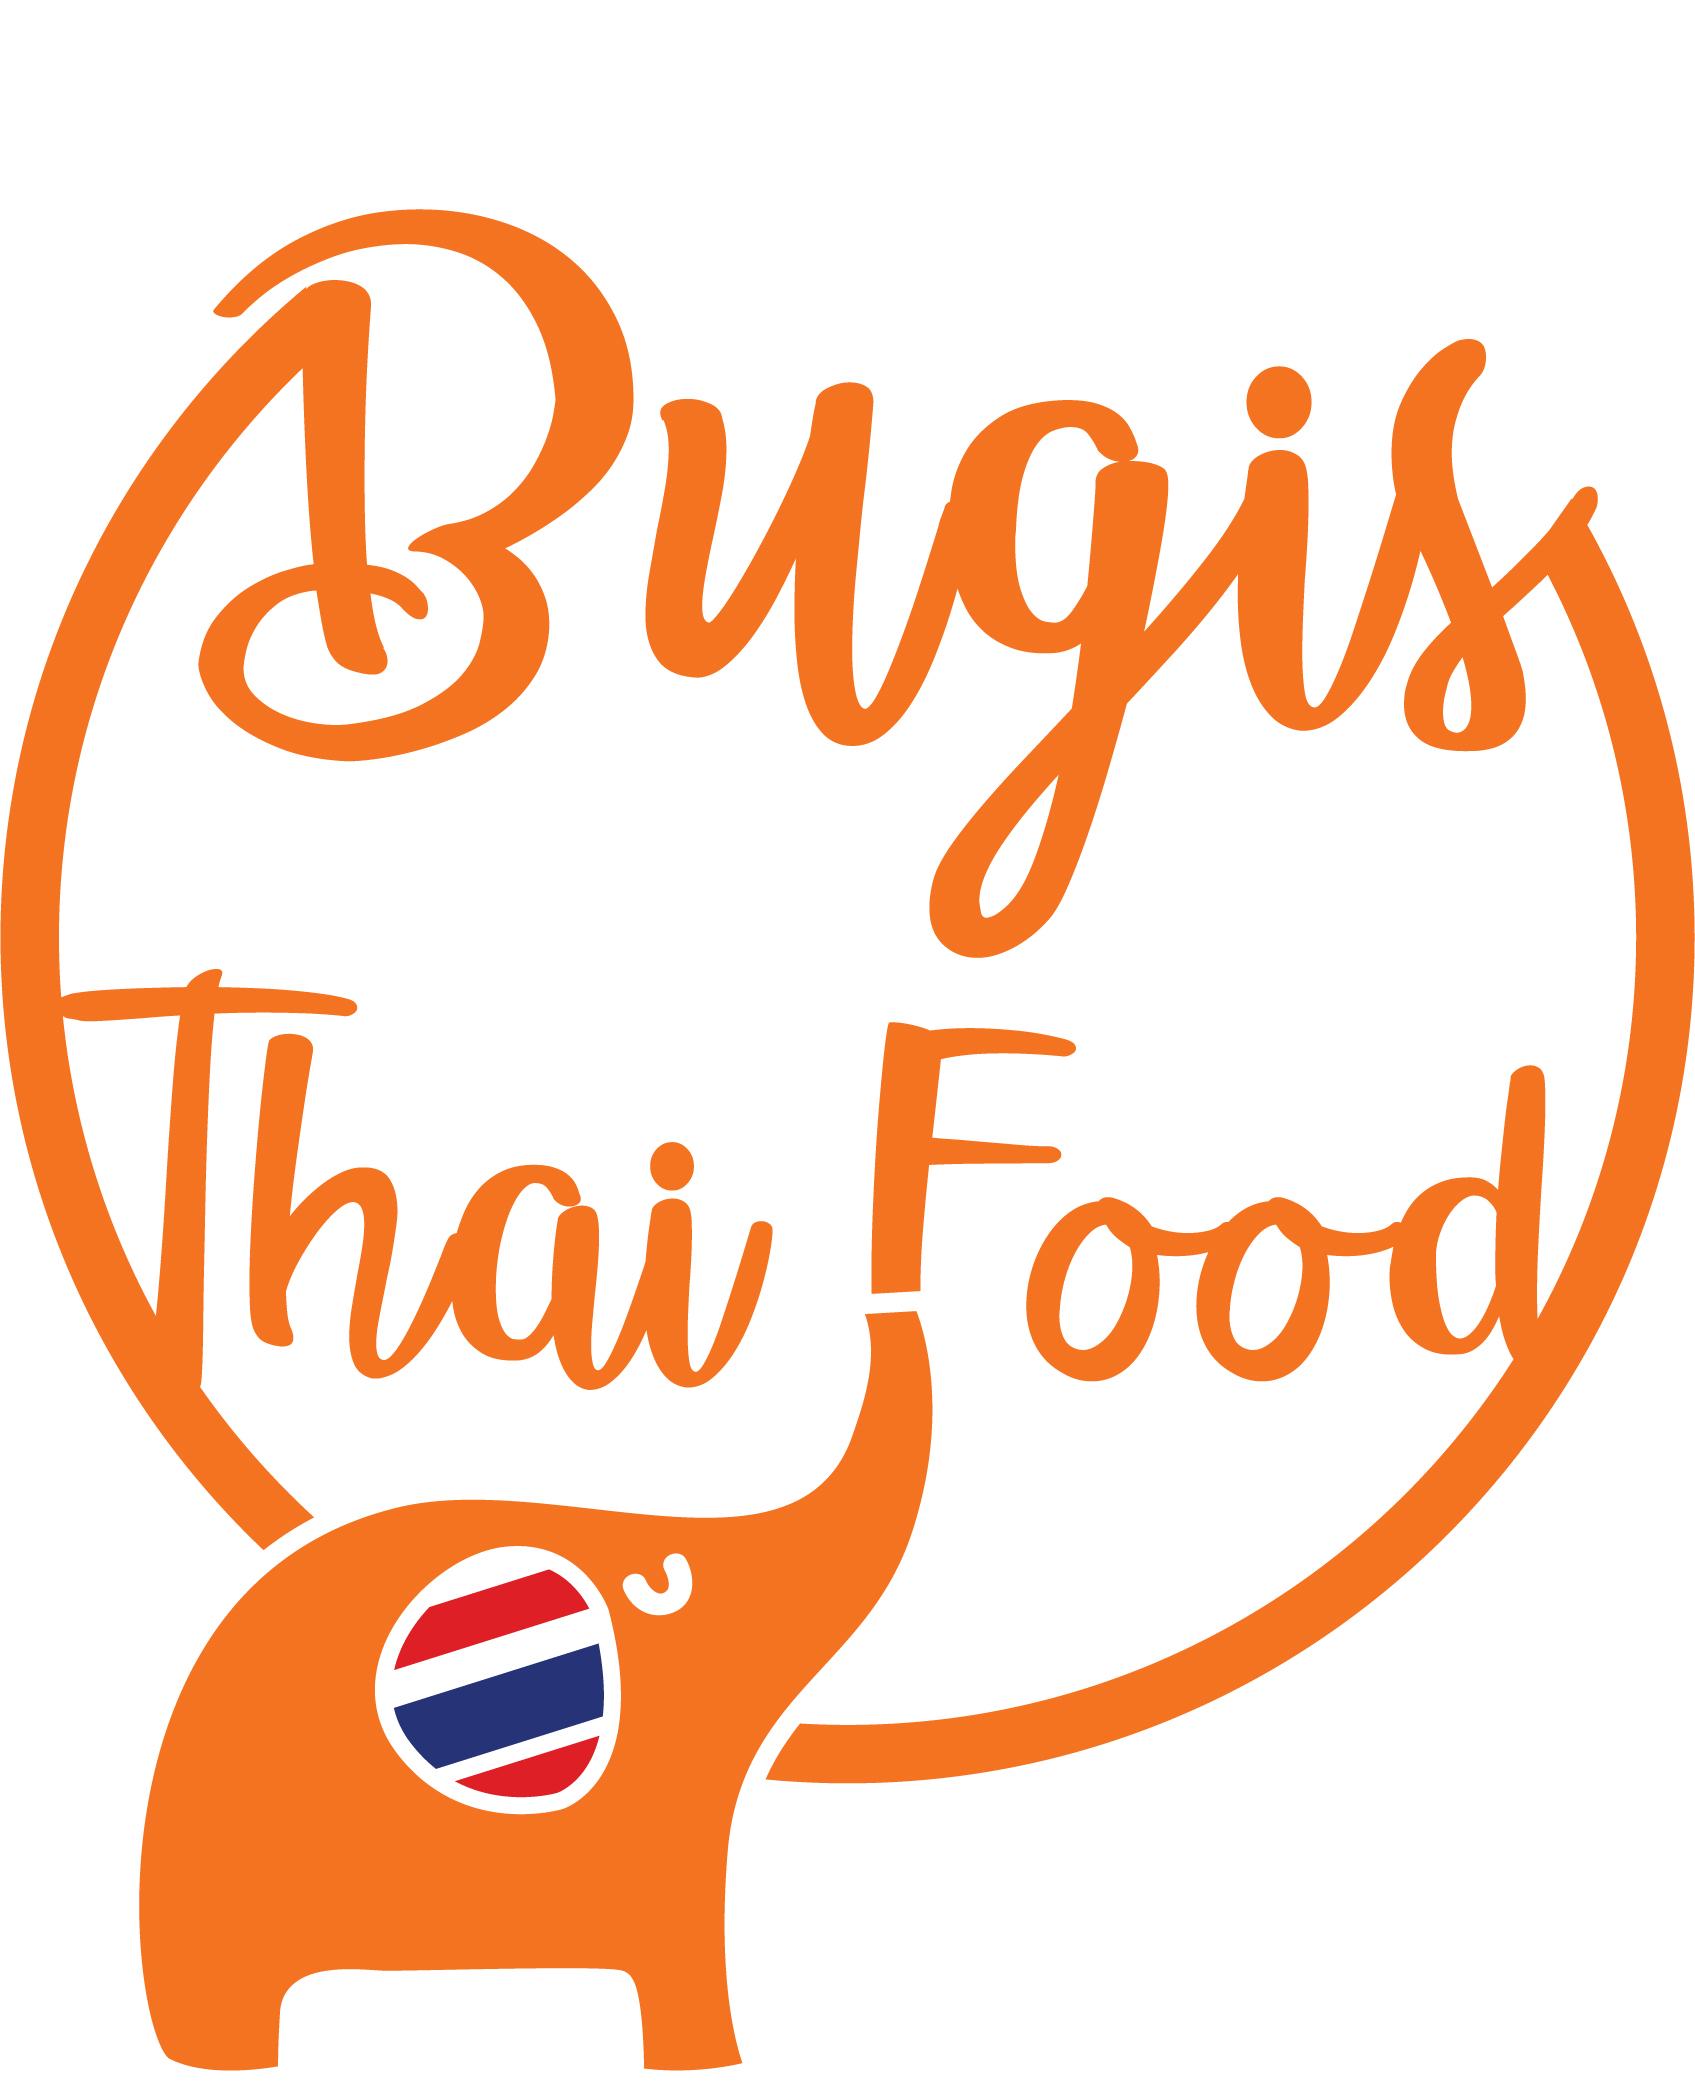 bugis Thai food logo.jpg